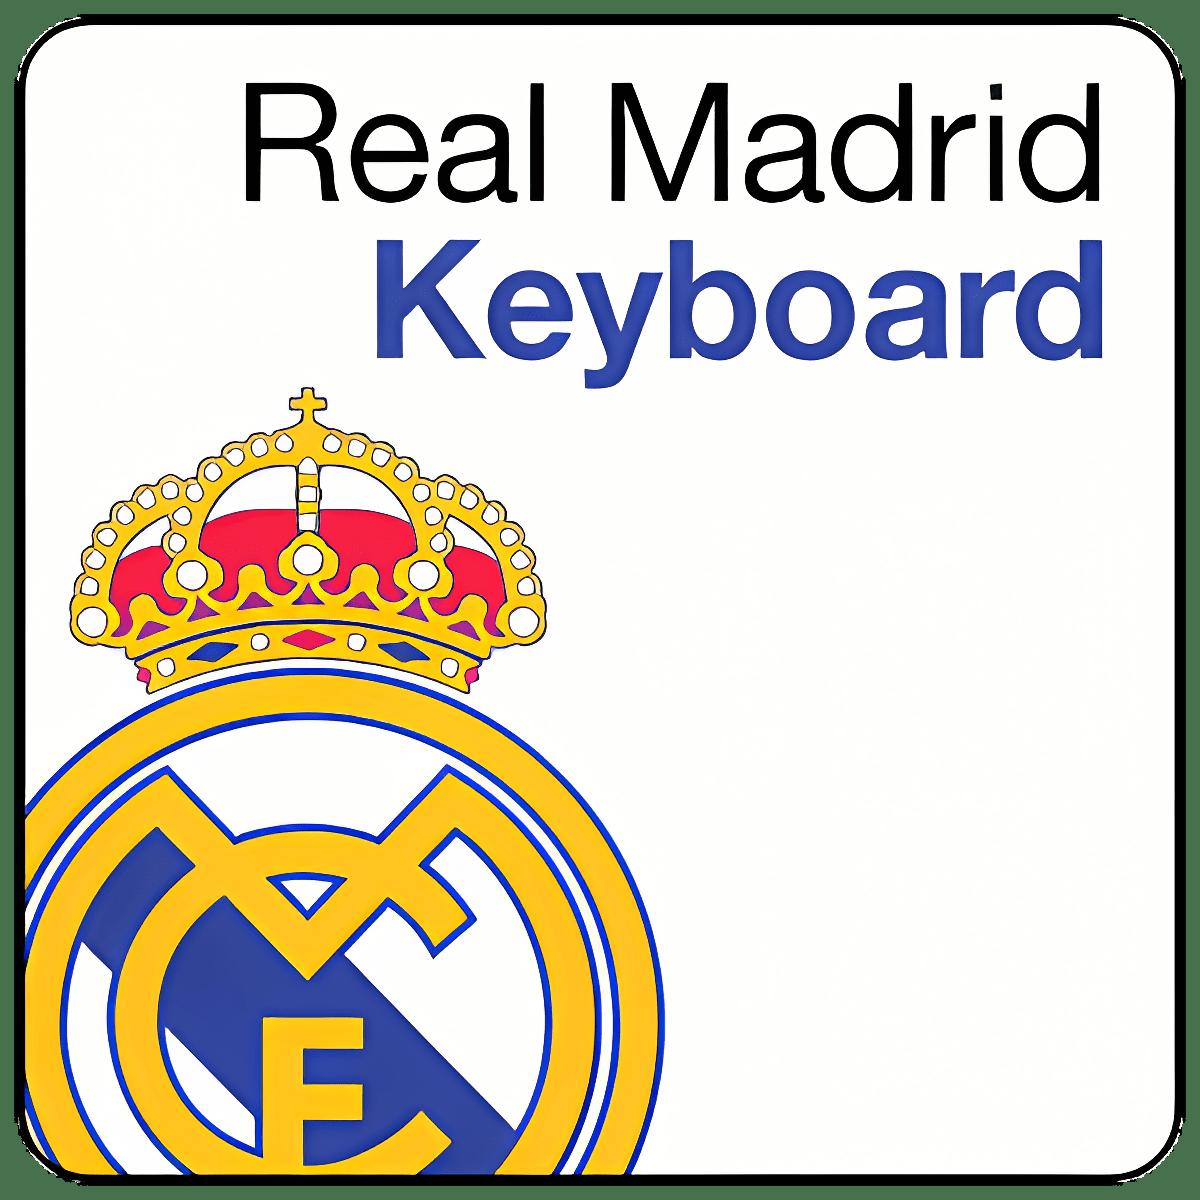 Real Madrid Keyboard 3.0.58.362